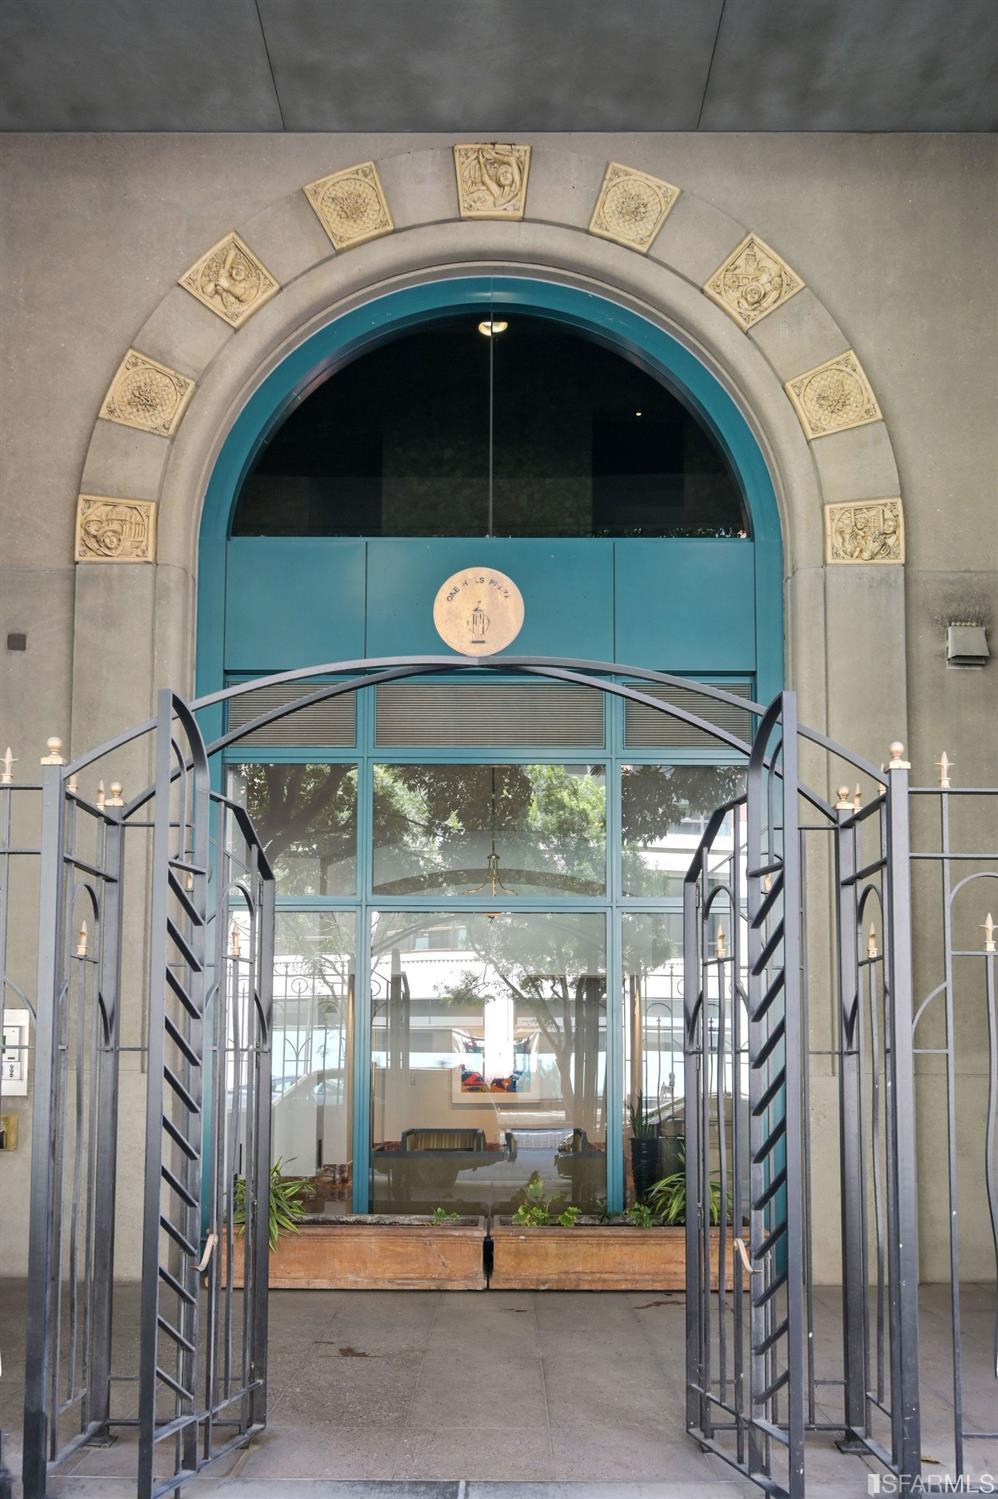 Residential entry emulates Hills Plaza, a National Historic landmark